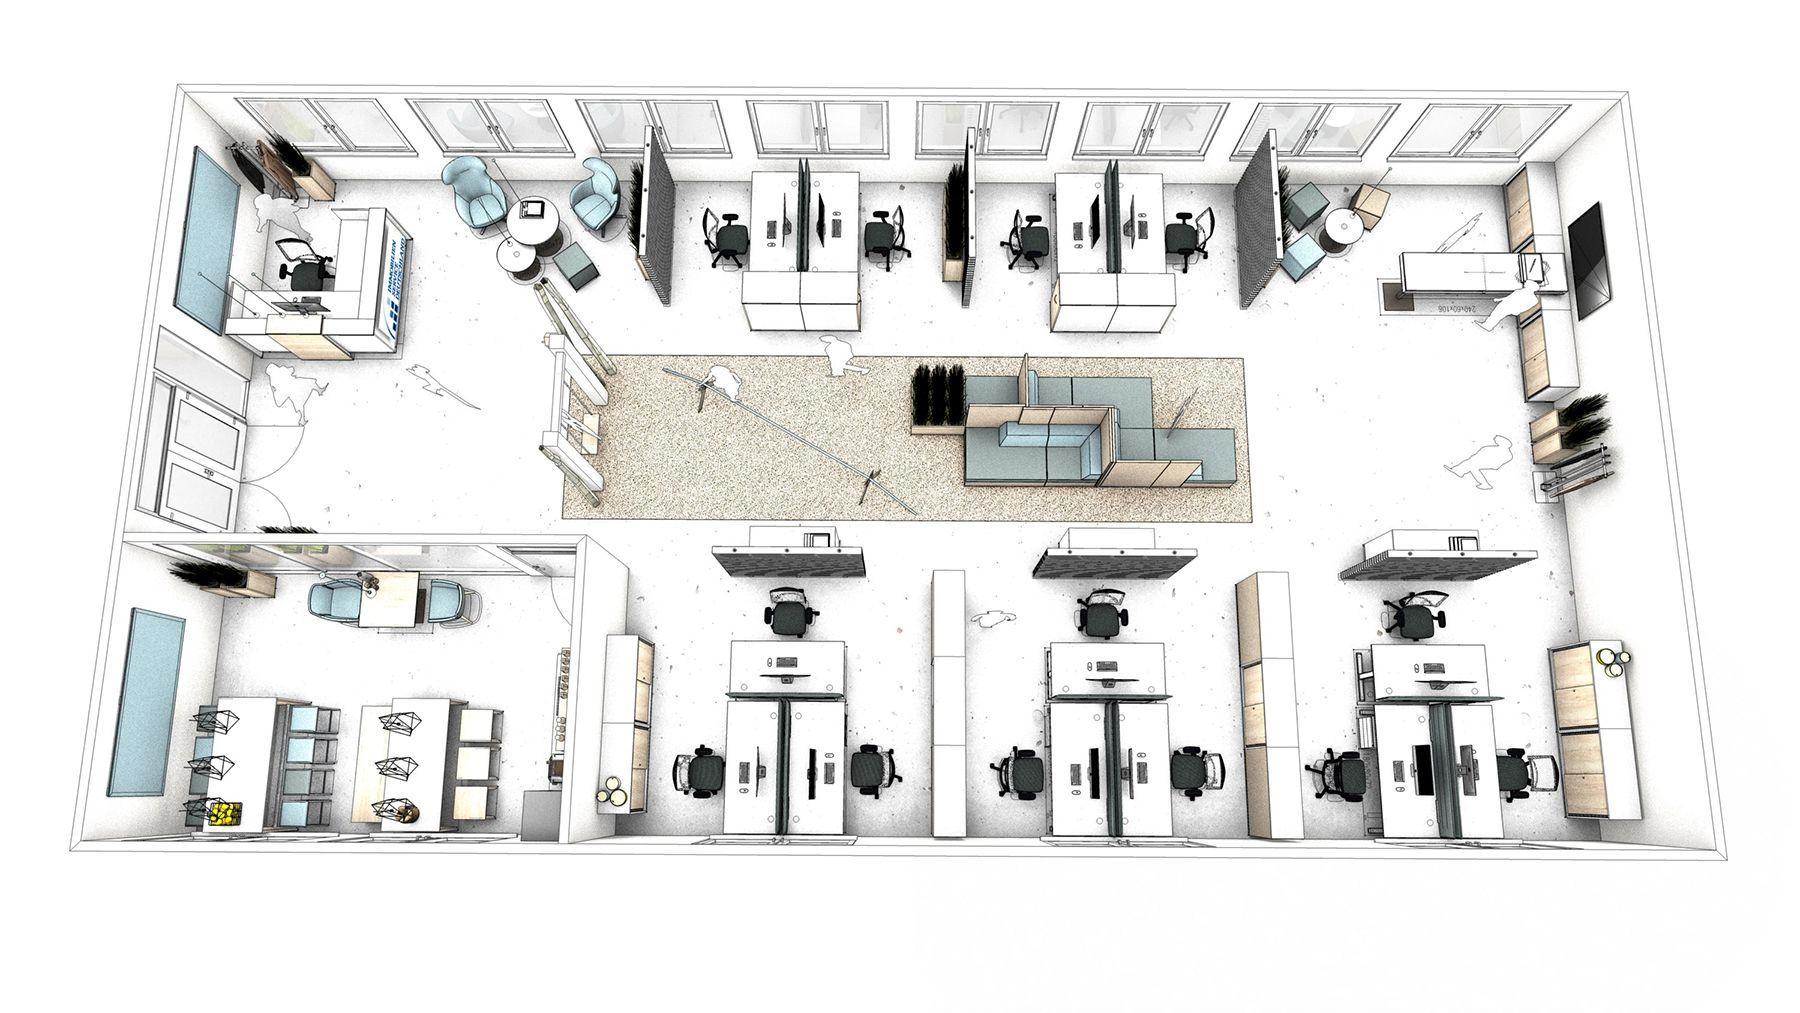 Grundriss Buro Open Space Buro Mit Empfang Arbeitsbreichen Sofa